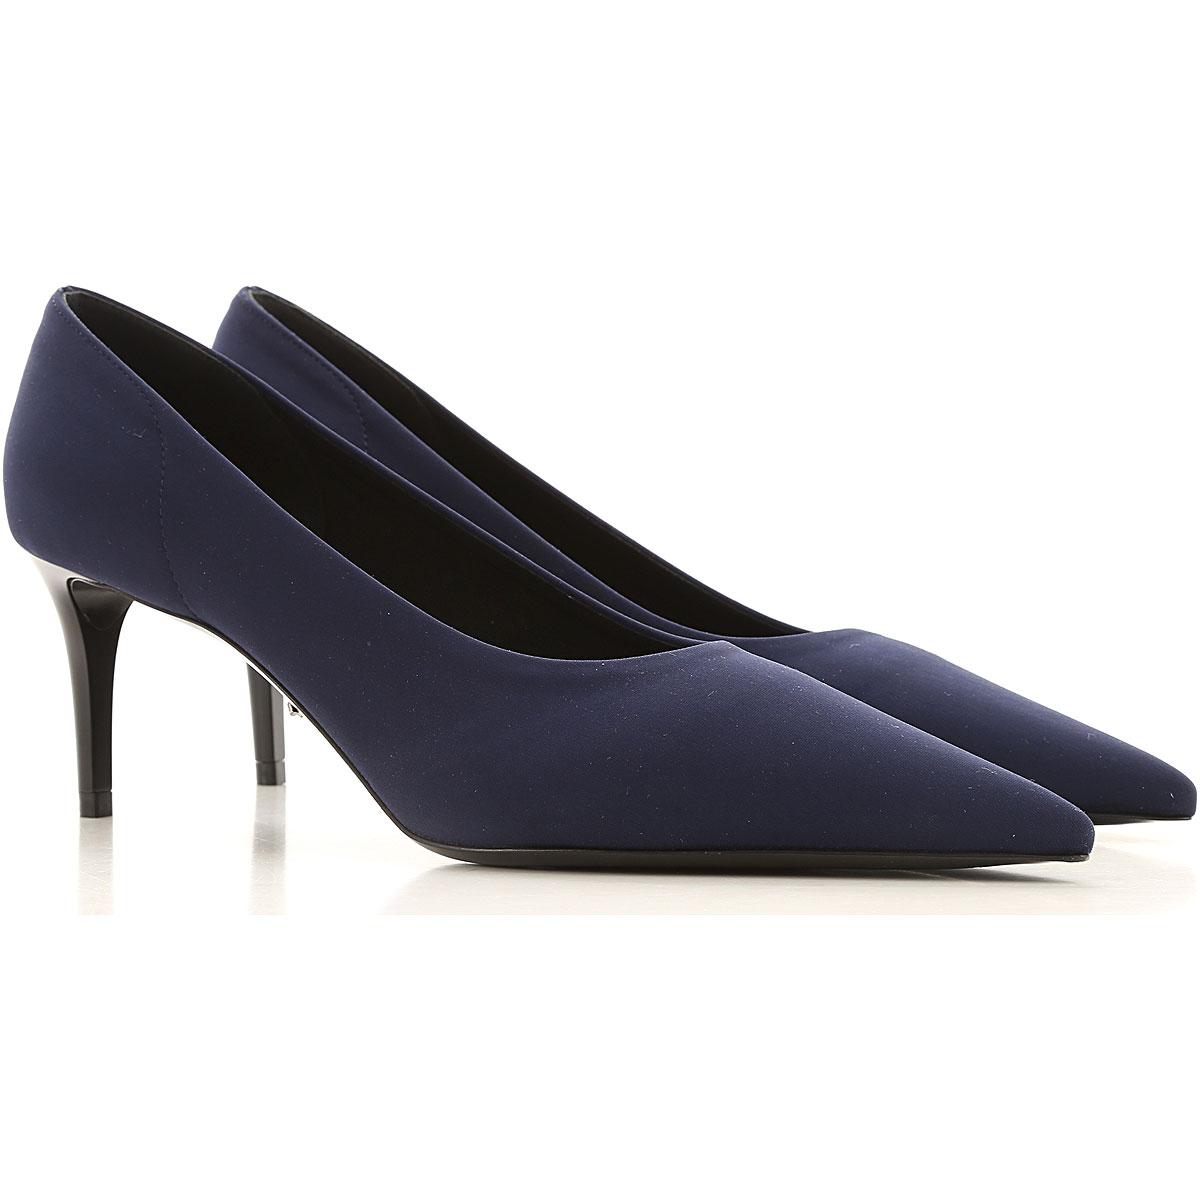 prada pumps & high heels for women on sale, dark blue, neoprene, 2019, 3 3.5 4 4.5 5 5.5 6 6.5